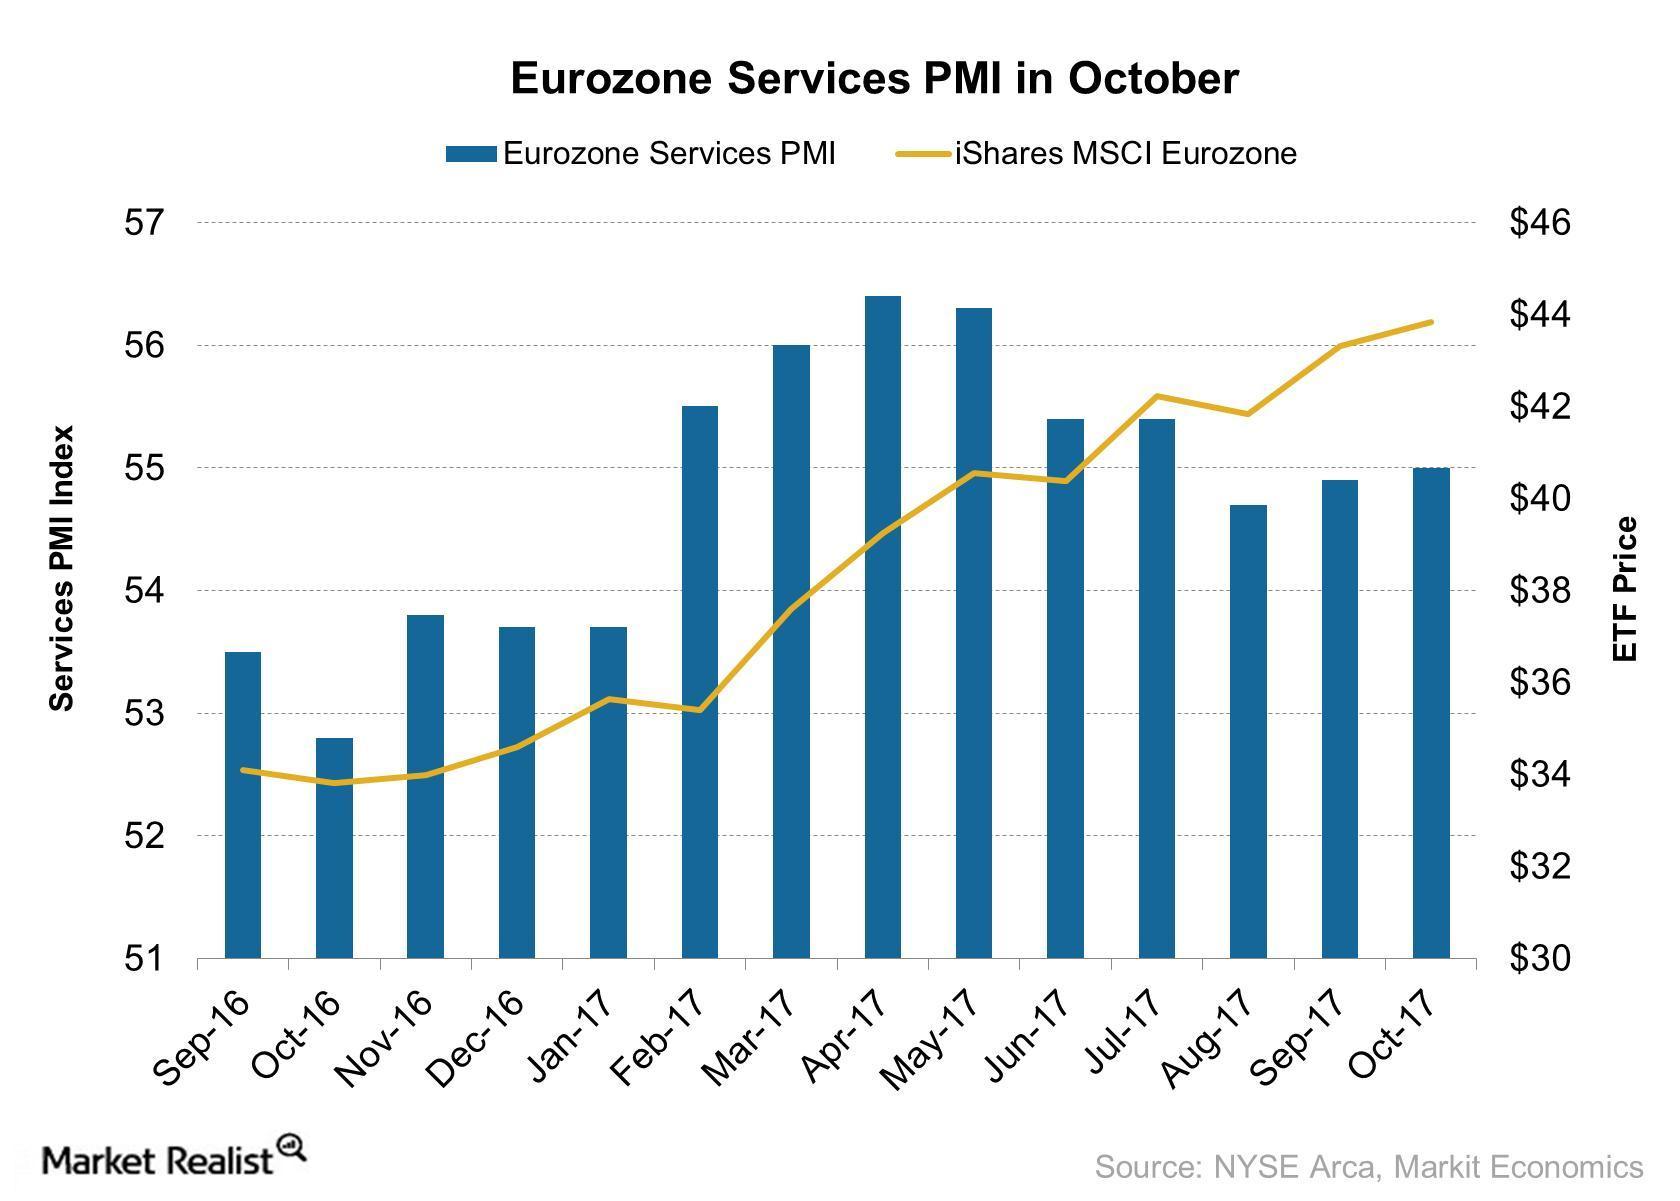 uploads///Eurozone Services PMI in October